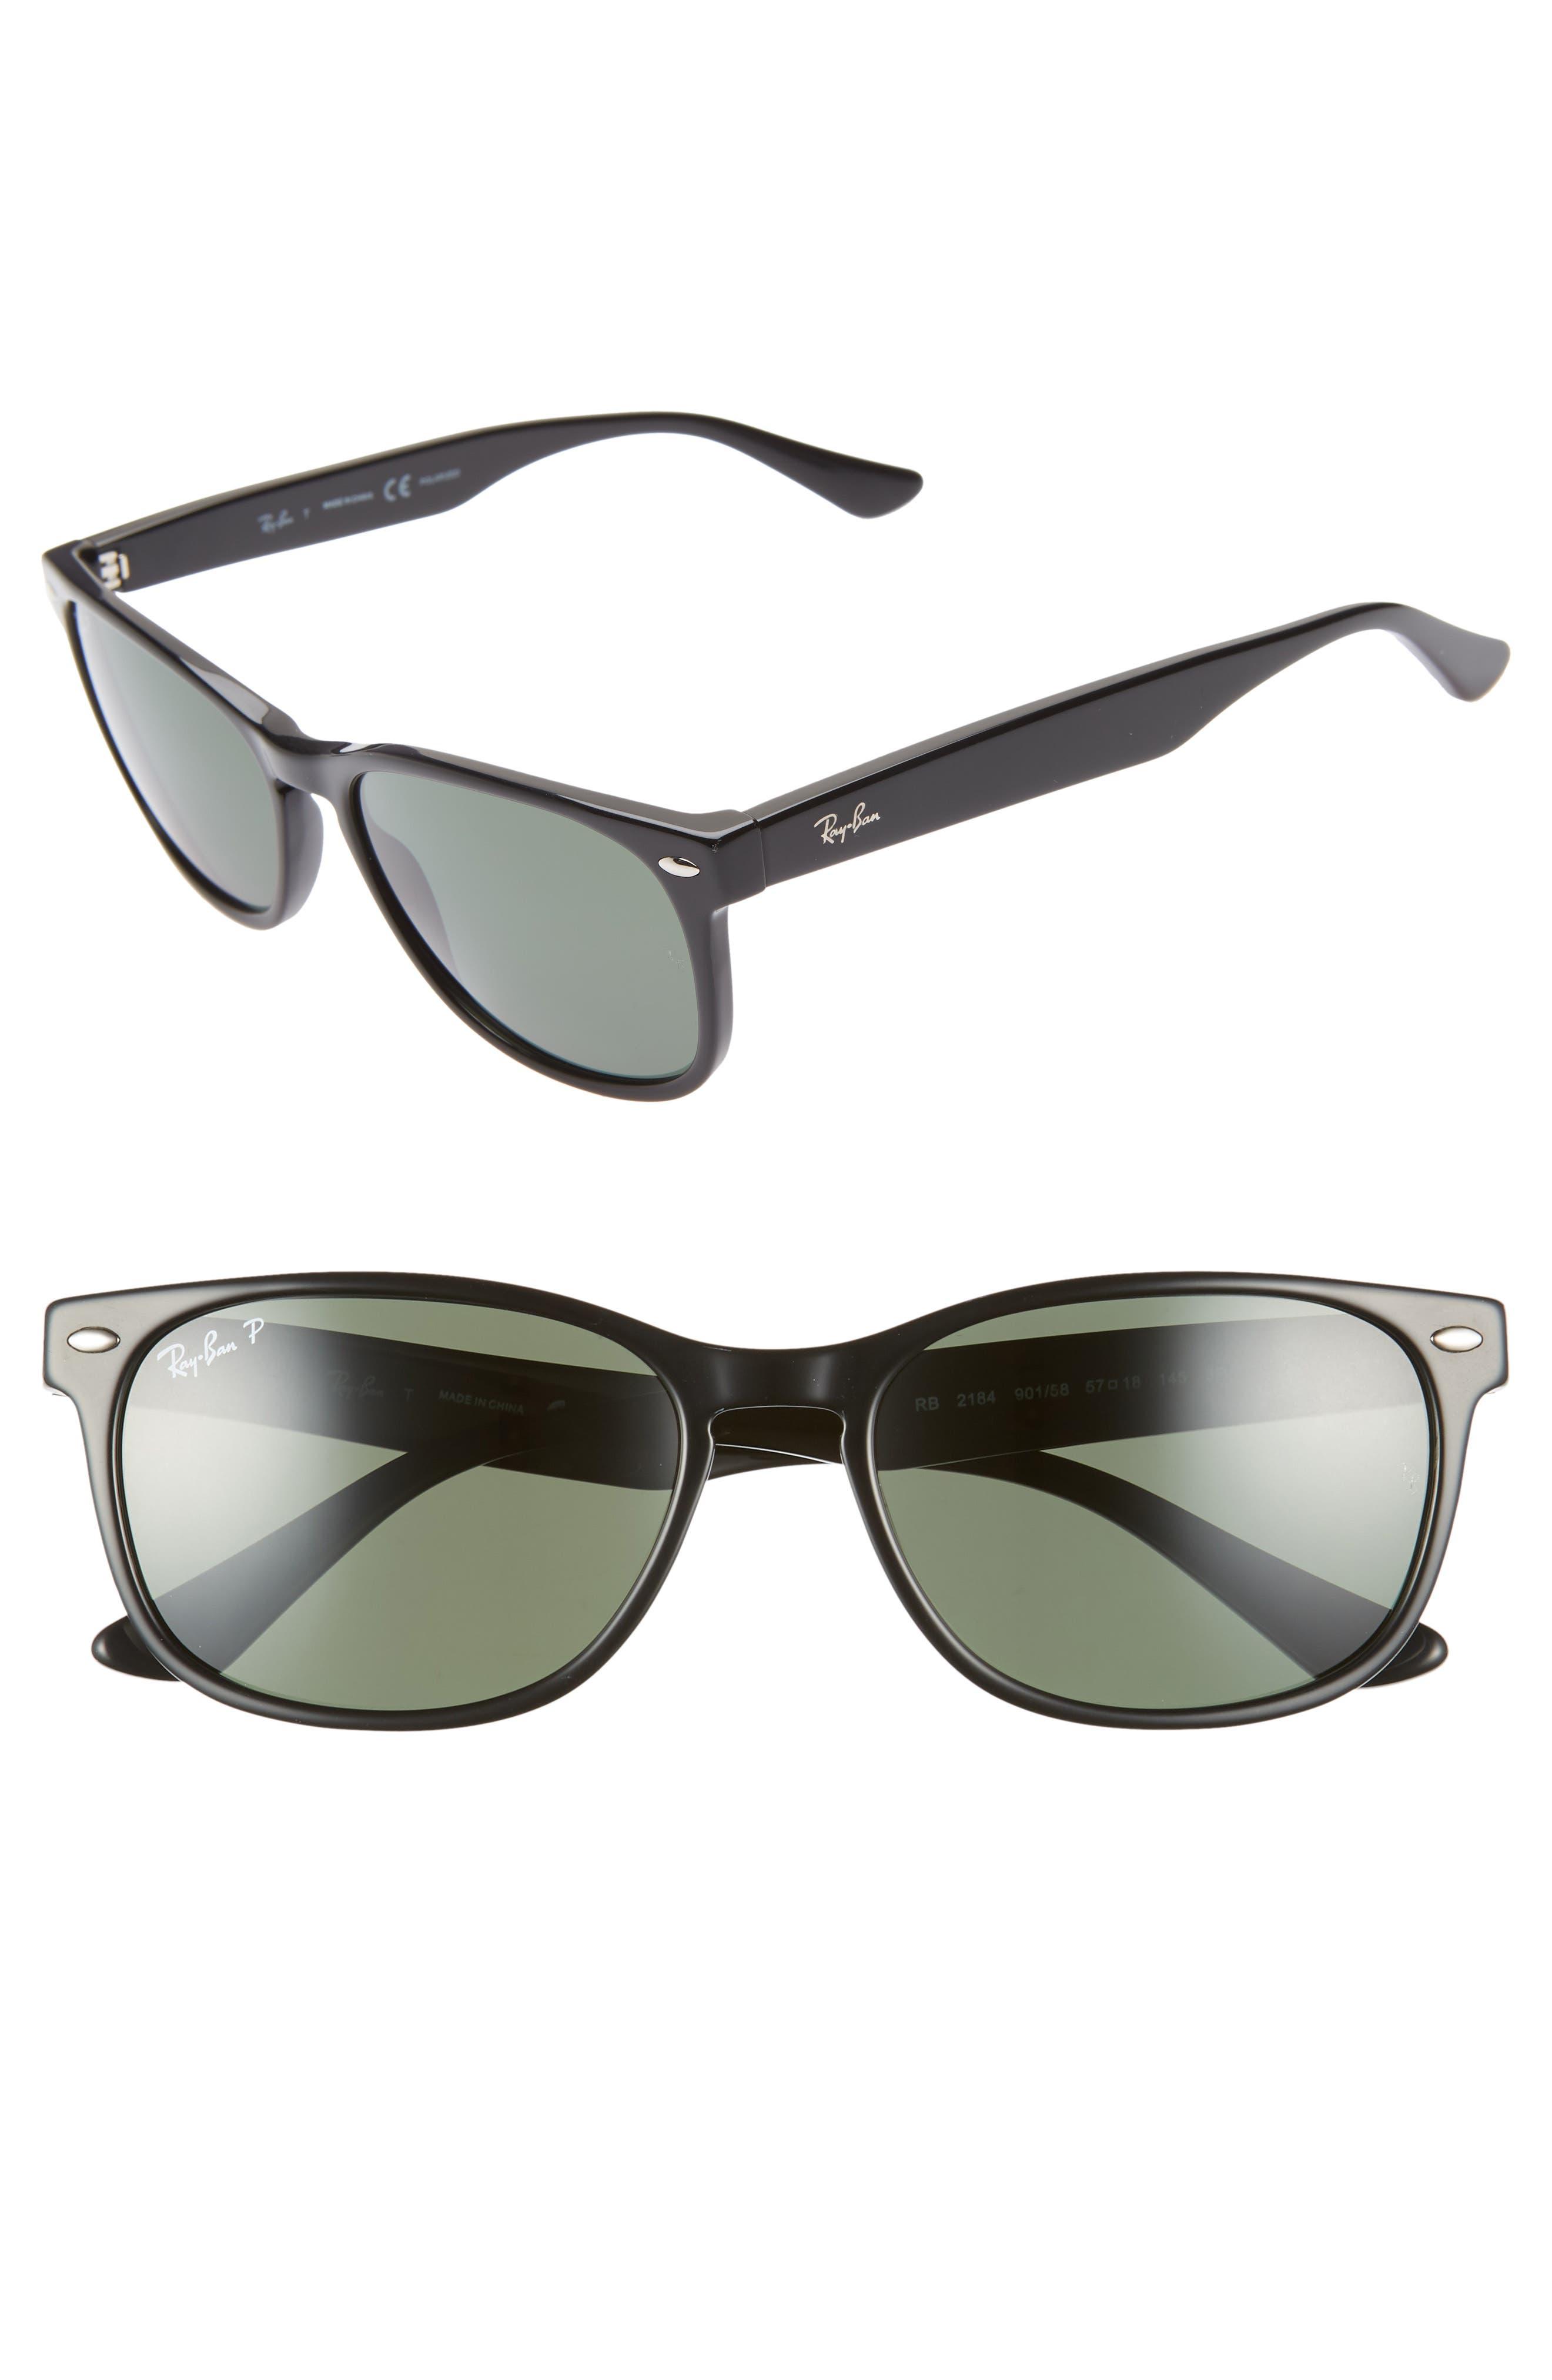 57mm Wayfarer Polarized Sunglasses,                             Main thumbnail 1, color,                             BLACK/ GREEN SOLID